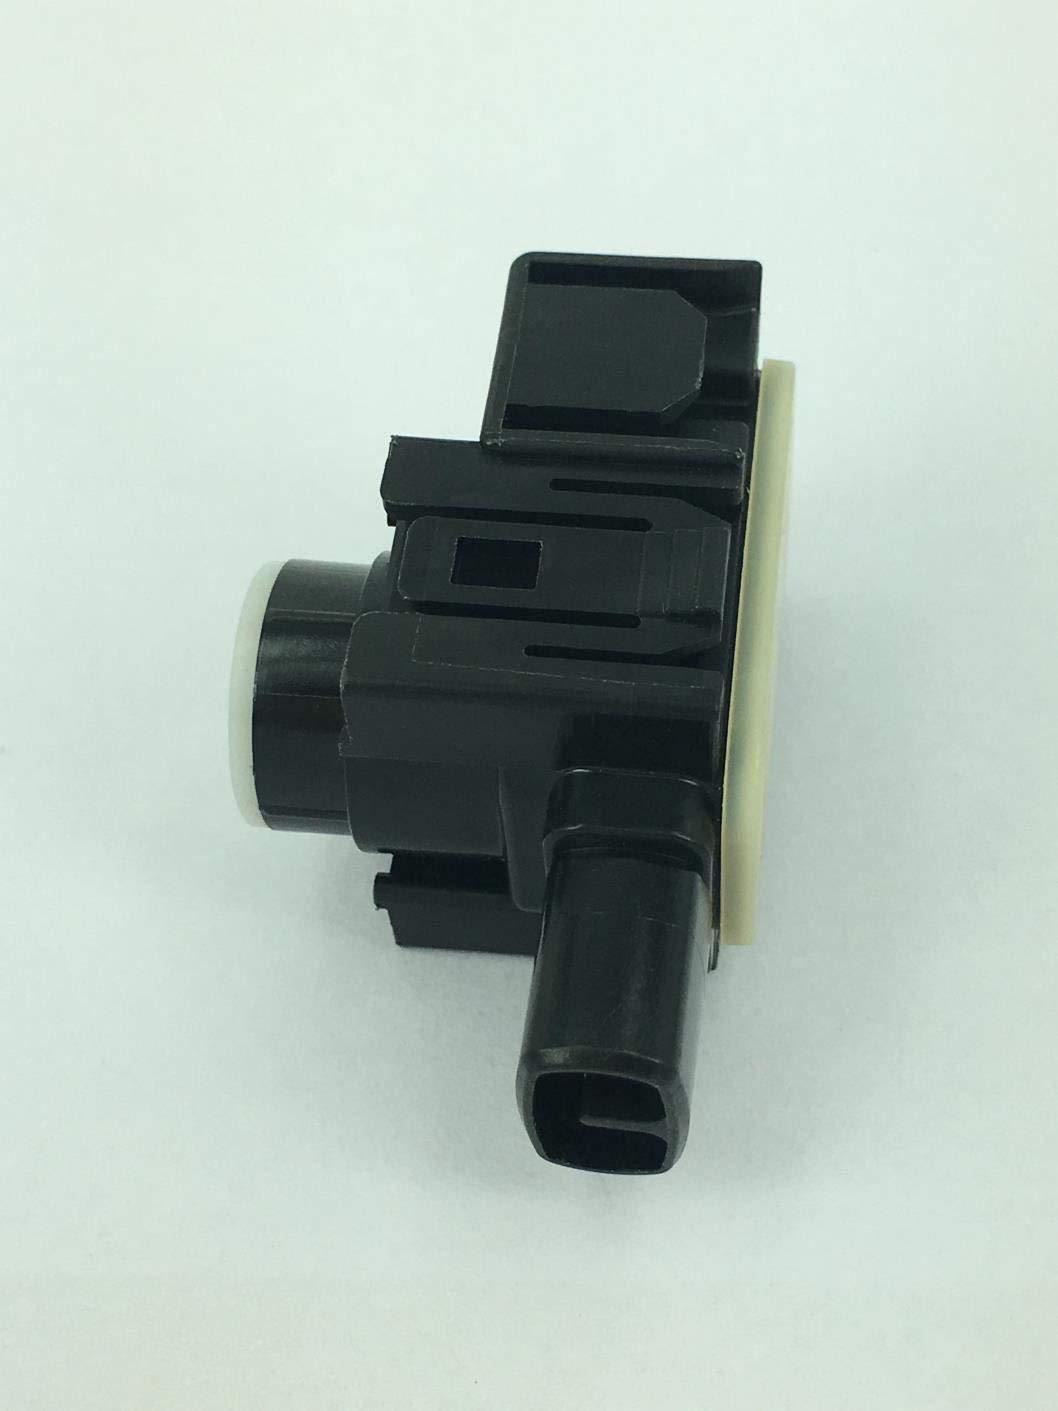 Lexus NX ULTRASONIC Bumper Parking Sensor PDC OEM 89341-78010-A0 White Hass Foshan Nanhai Auto Parts